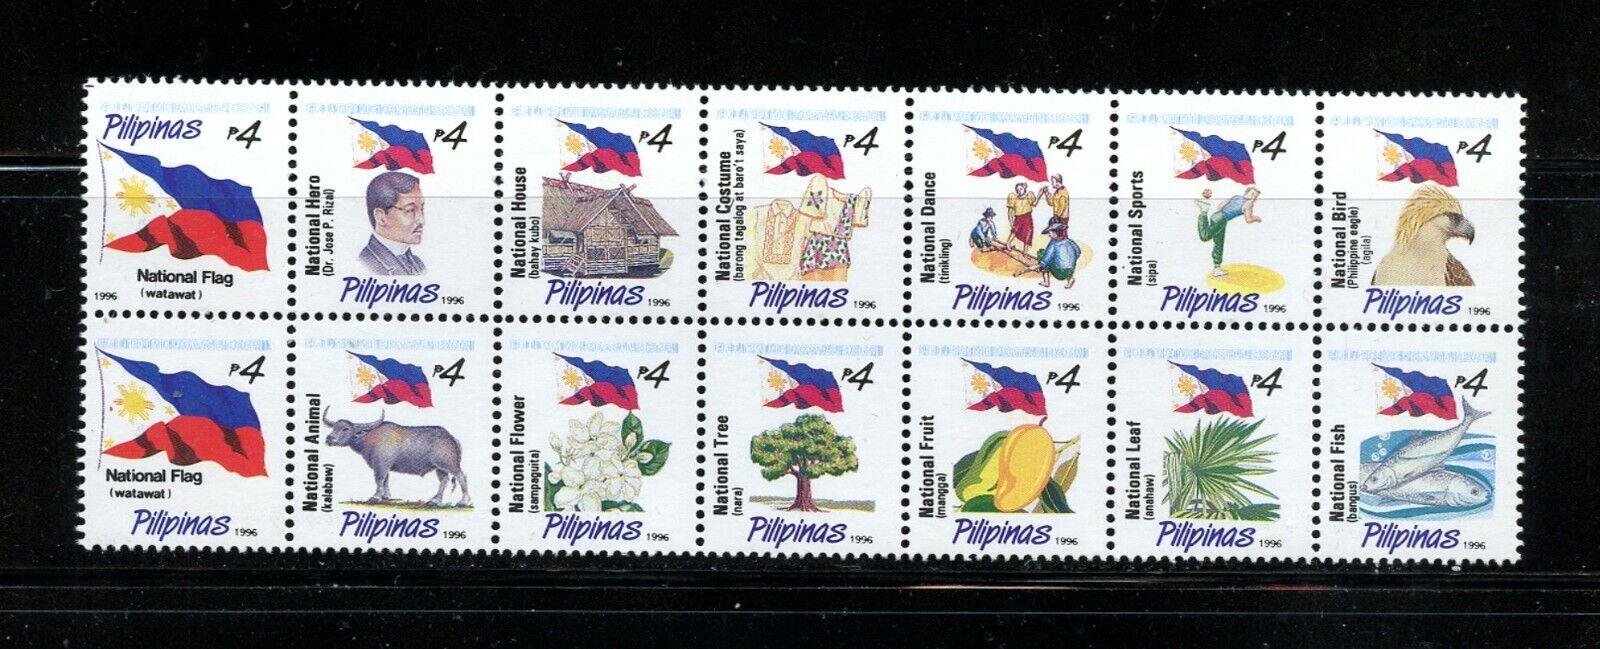 Z165 Philippines 1996 National Symbols Flags Birds Fish Flora BLOCK MNH - $9.96